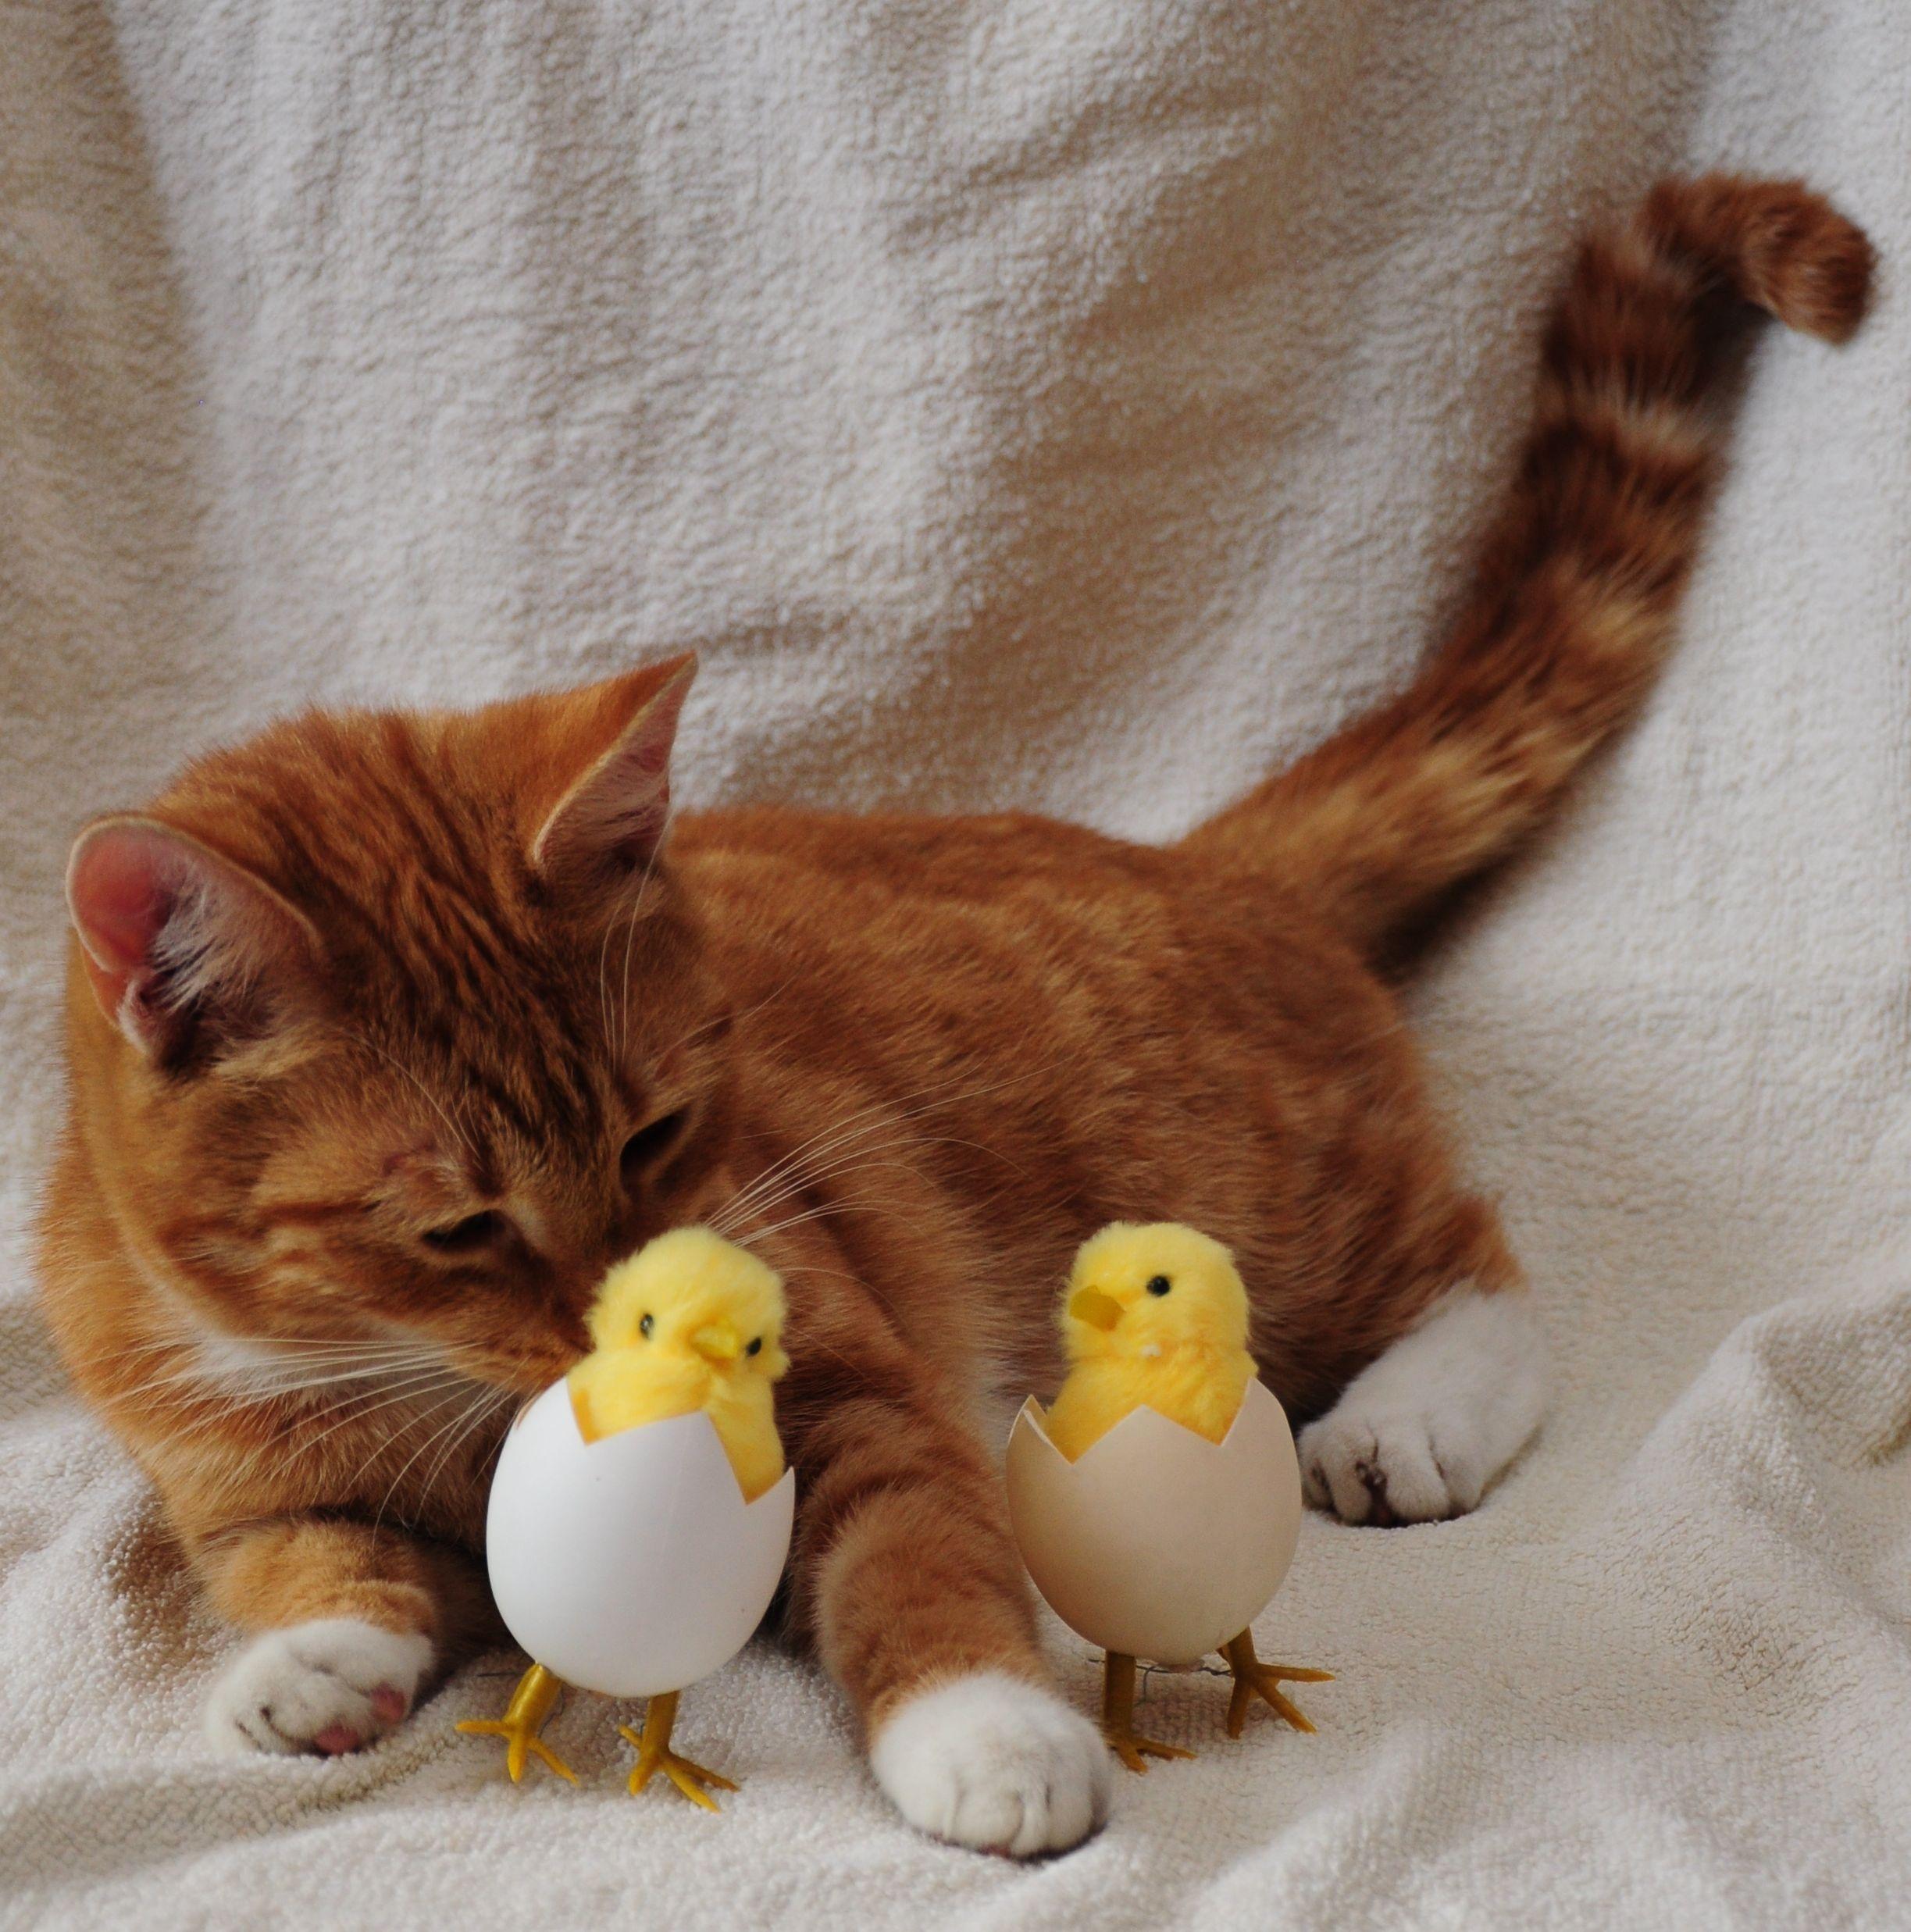 Gambar Anak Kucing Binatang Menyusui Telur Cambang